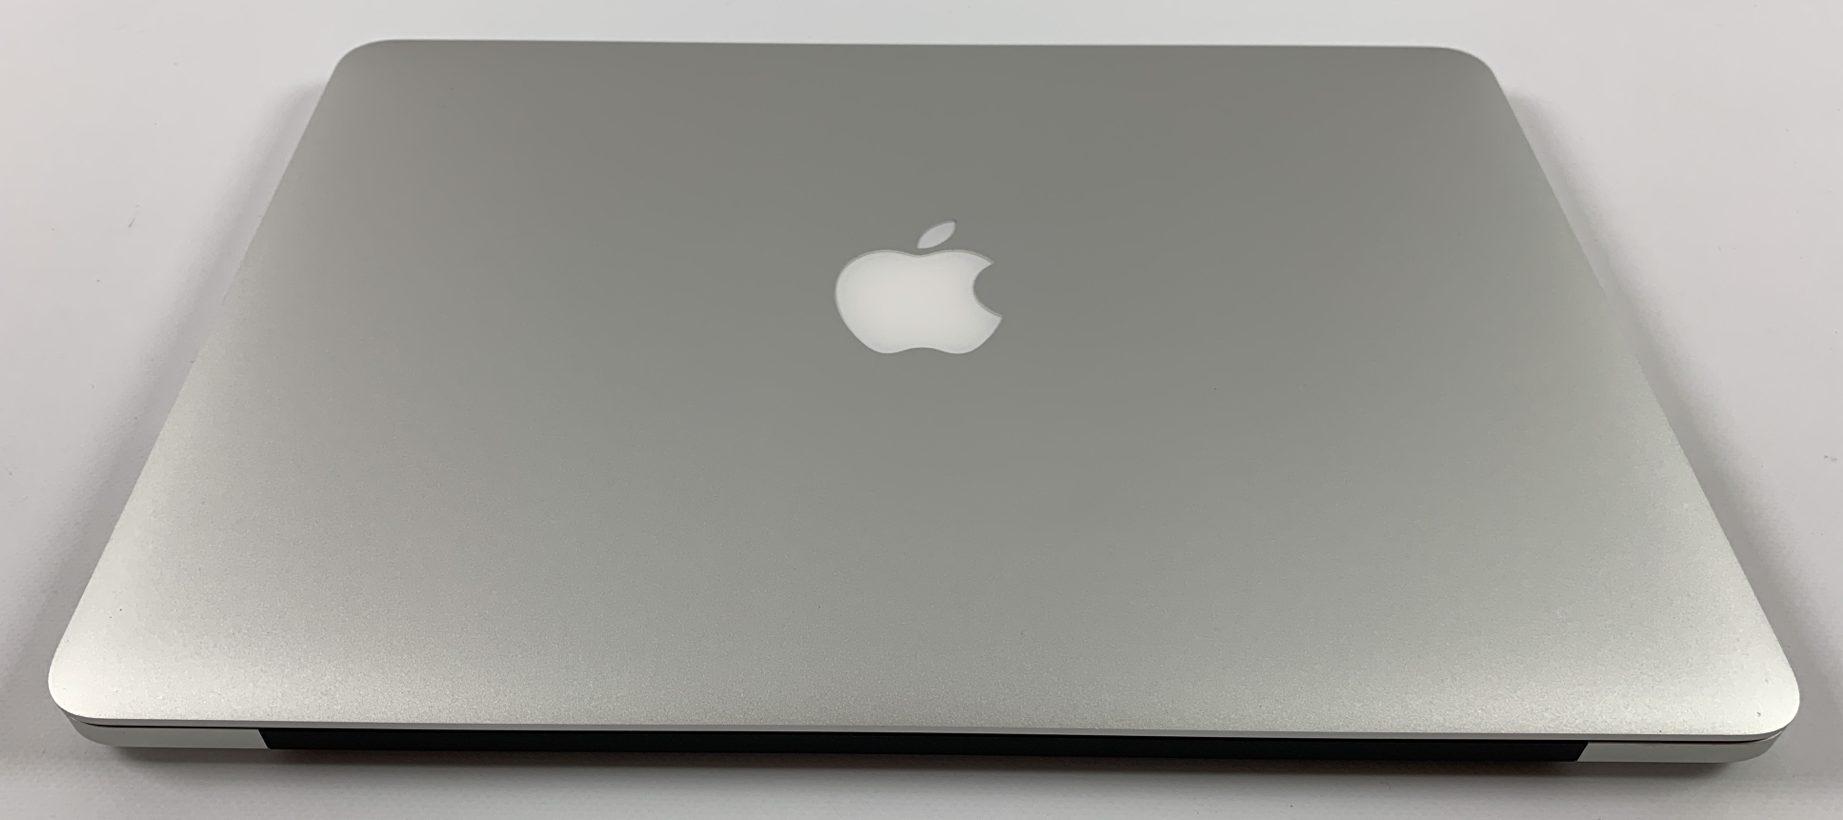 "MacBook Pro Retina 13"" Early 2015 (Intel Core i5 2.7 GHz 8 GB RAM 128 GB SSD), Intel Core i5 2.7 GHz, 8 GB RAM, 128 GB SSD, image 2"